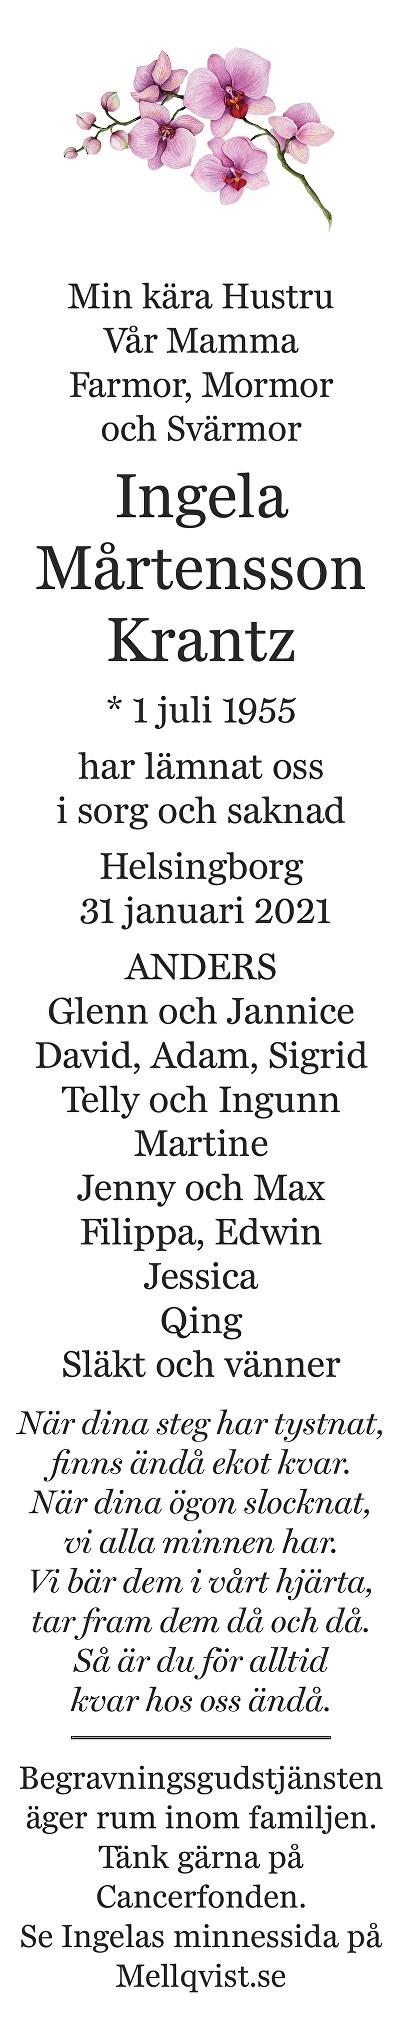 Ingela  Mårtensson Krantz Death notice